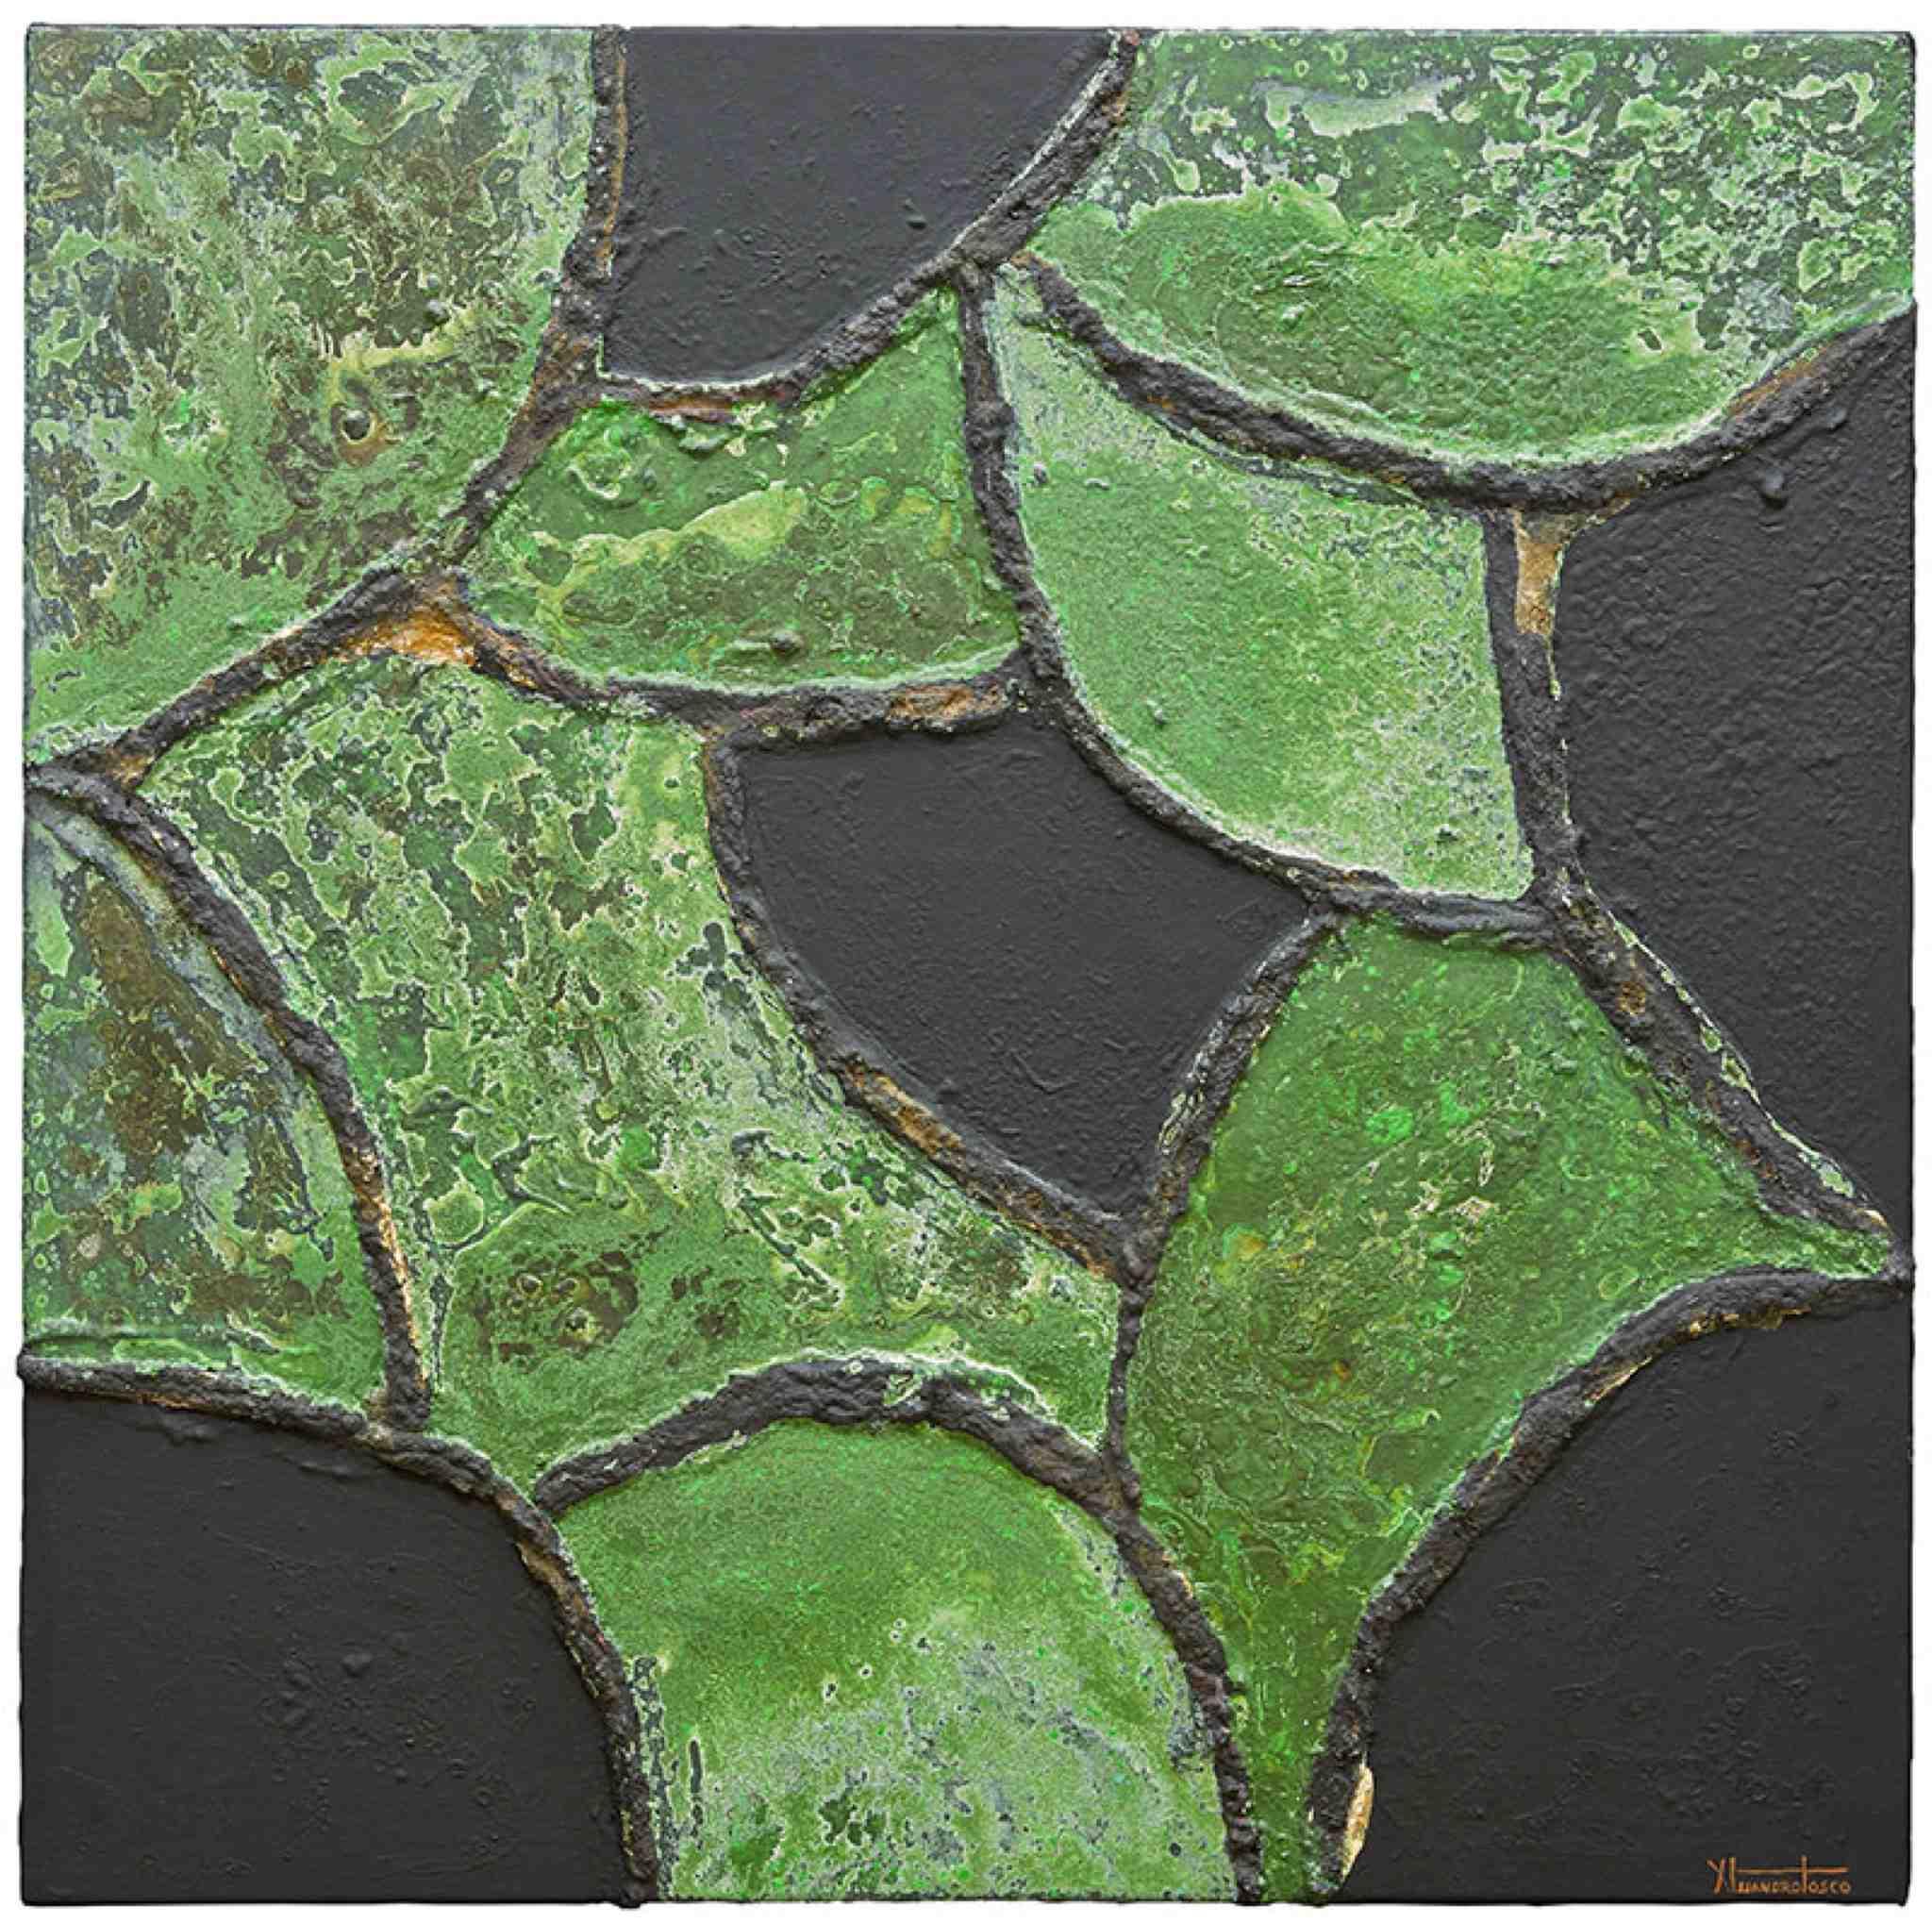 Unicelulares verdes